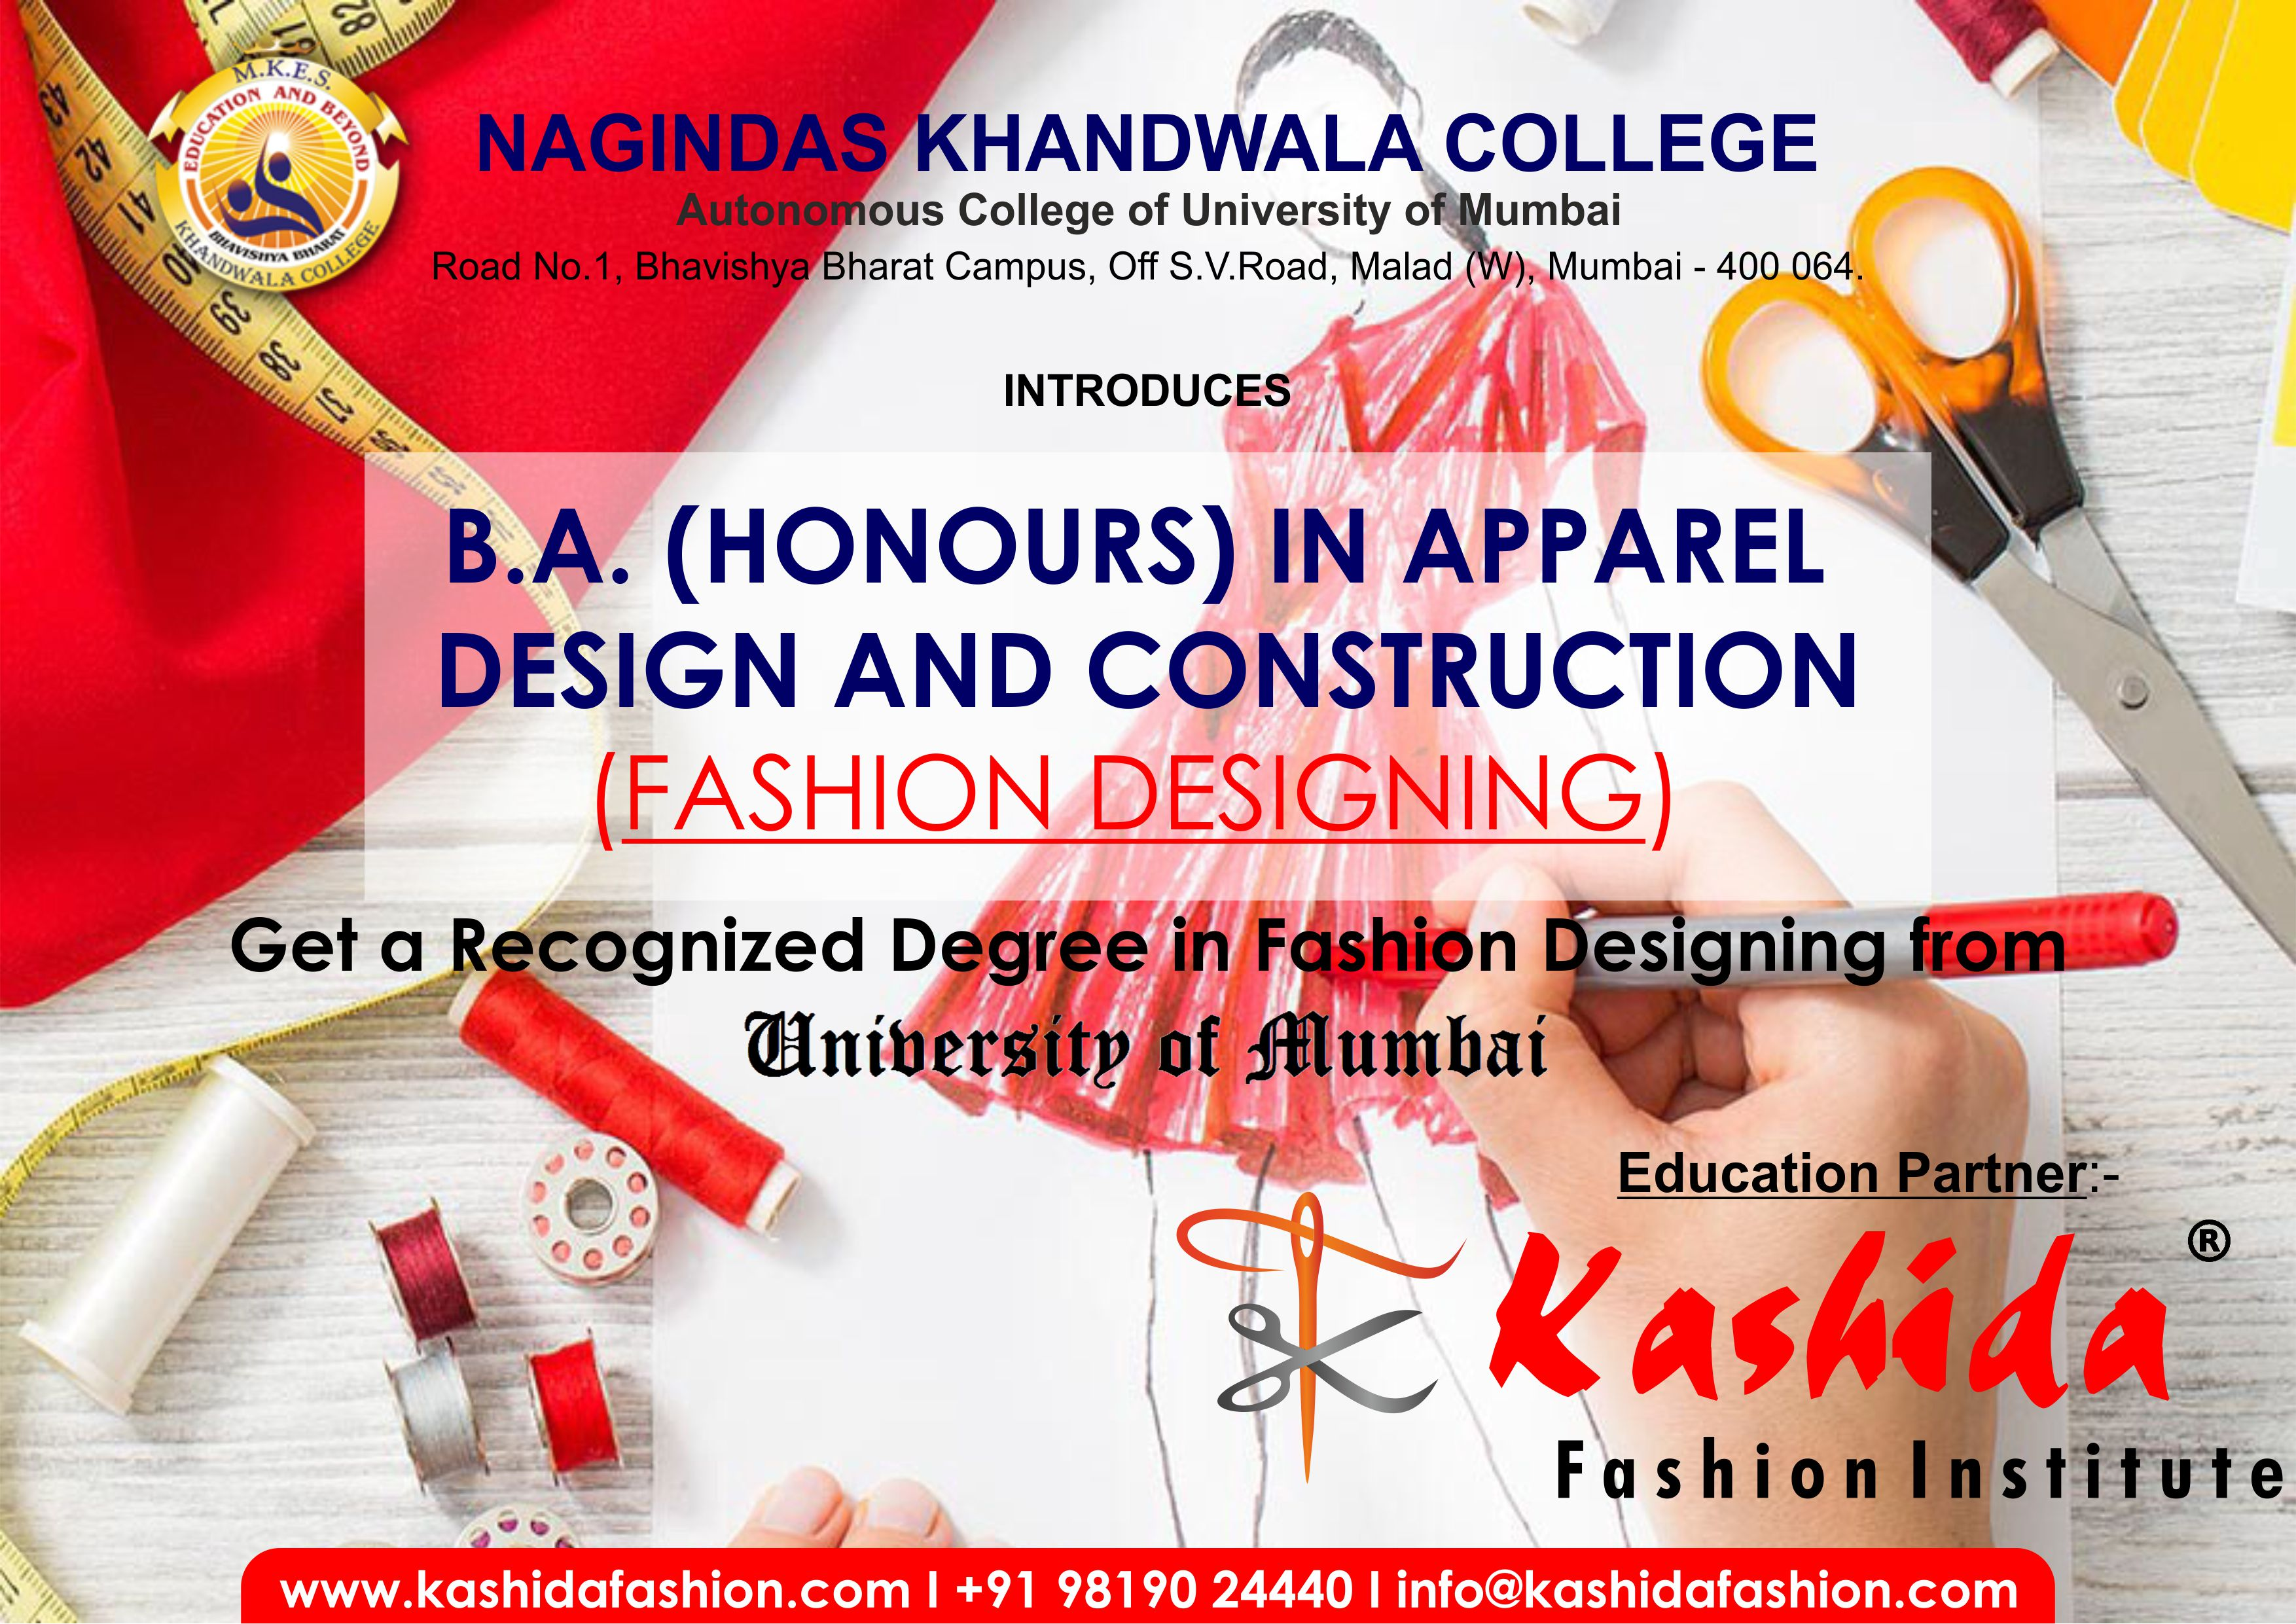 Welcome to Nagindas Khandwala College ::